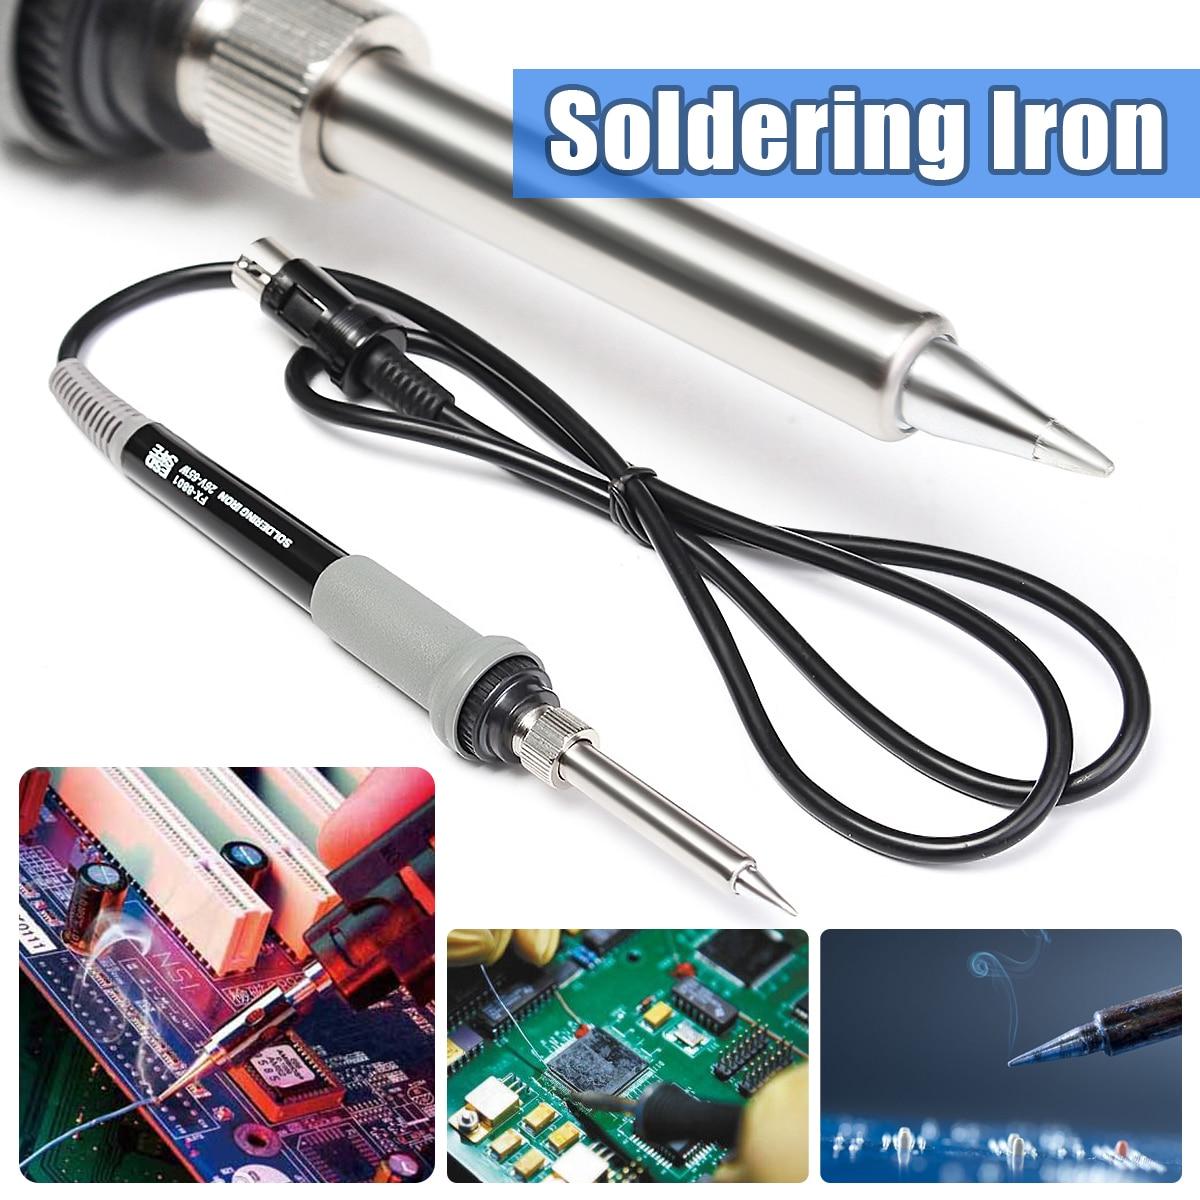 1PC Soldering Iron Handle Station 6Pin For HAKKO FX-888 FX-888D FX-8801 Soldering Working hakko fx 888d safe soldering station soldering iron esd safe 220v